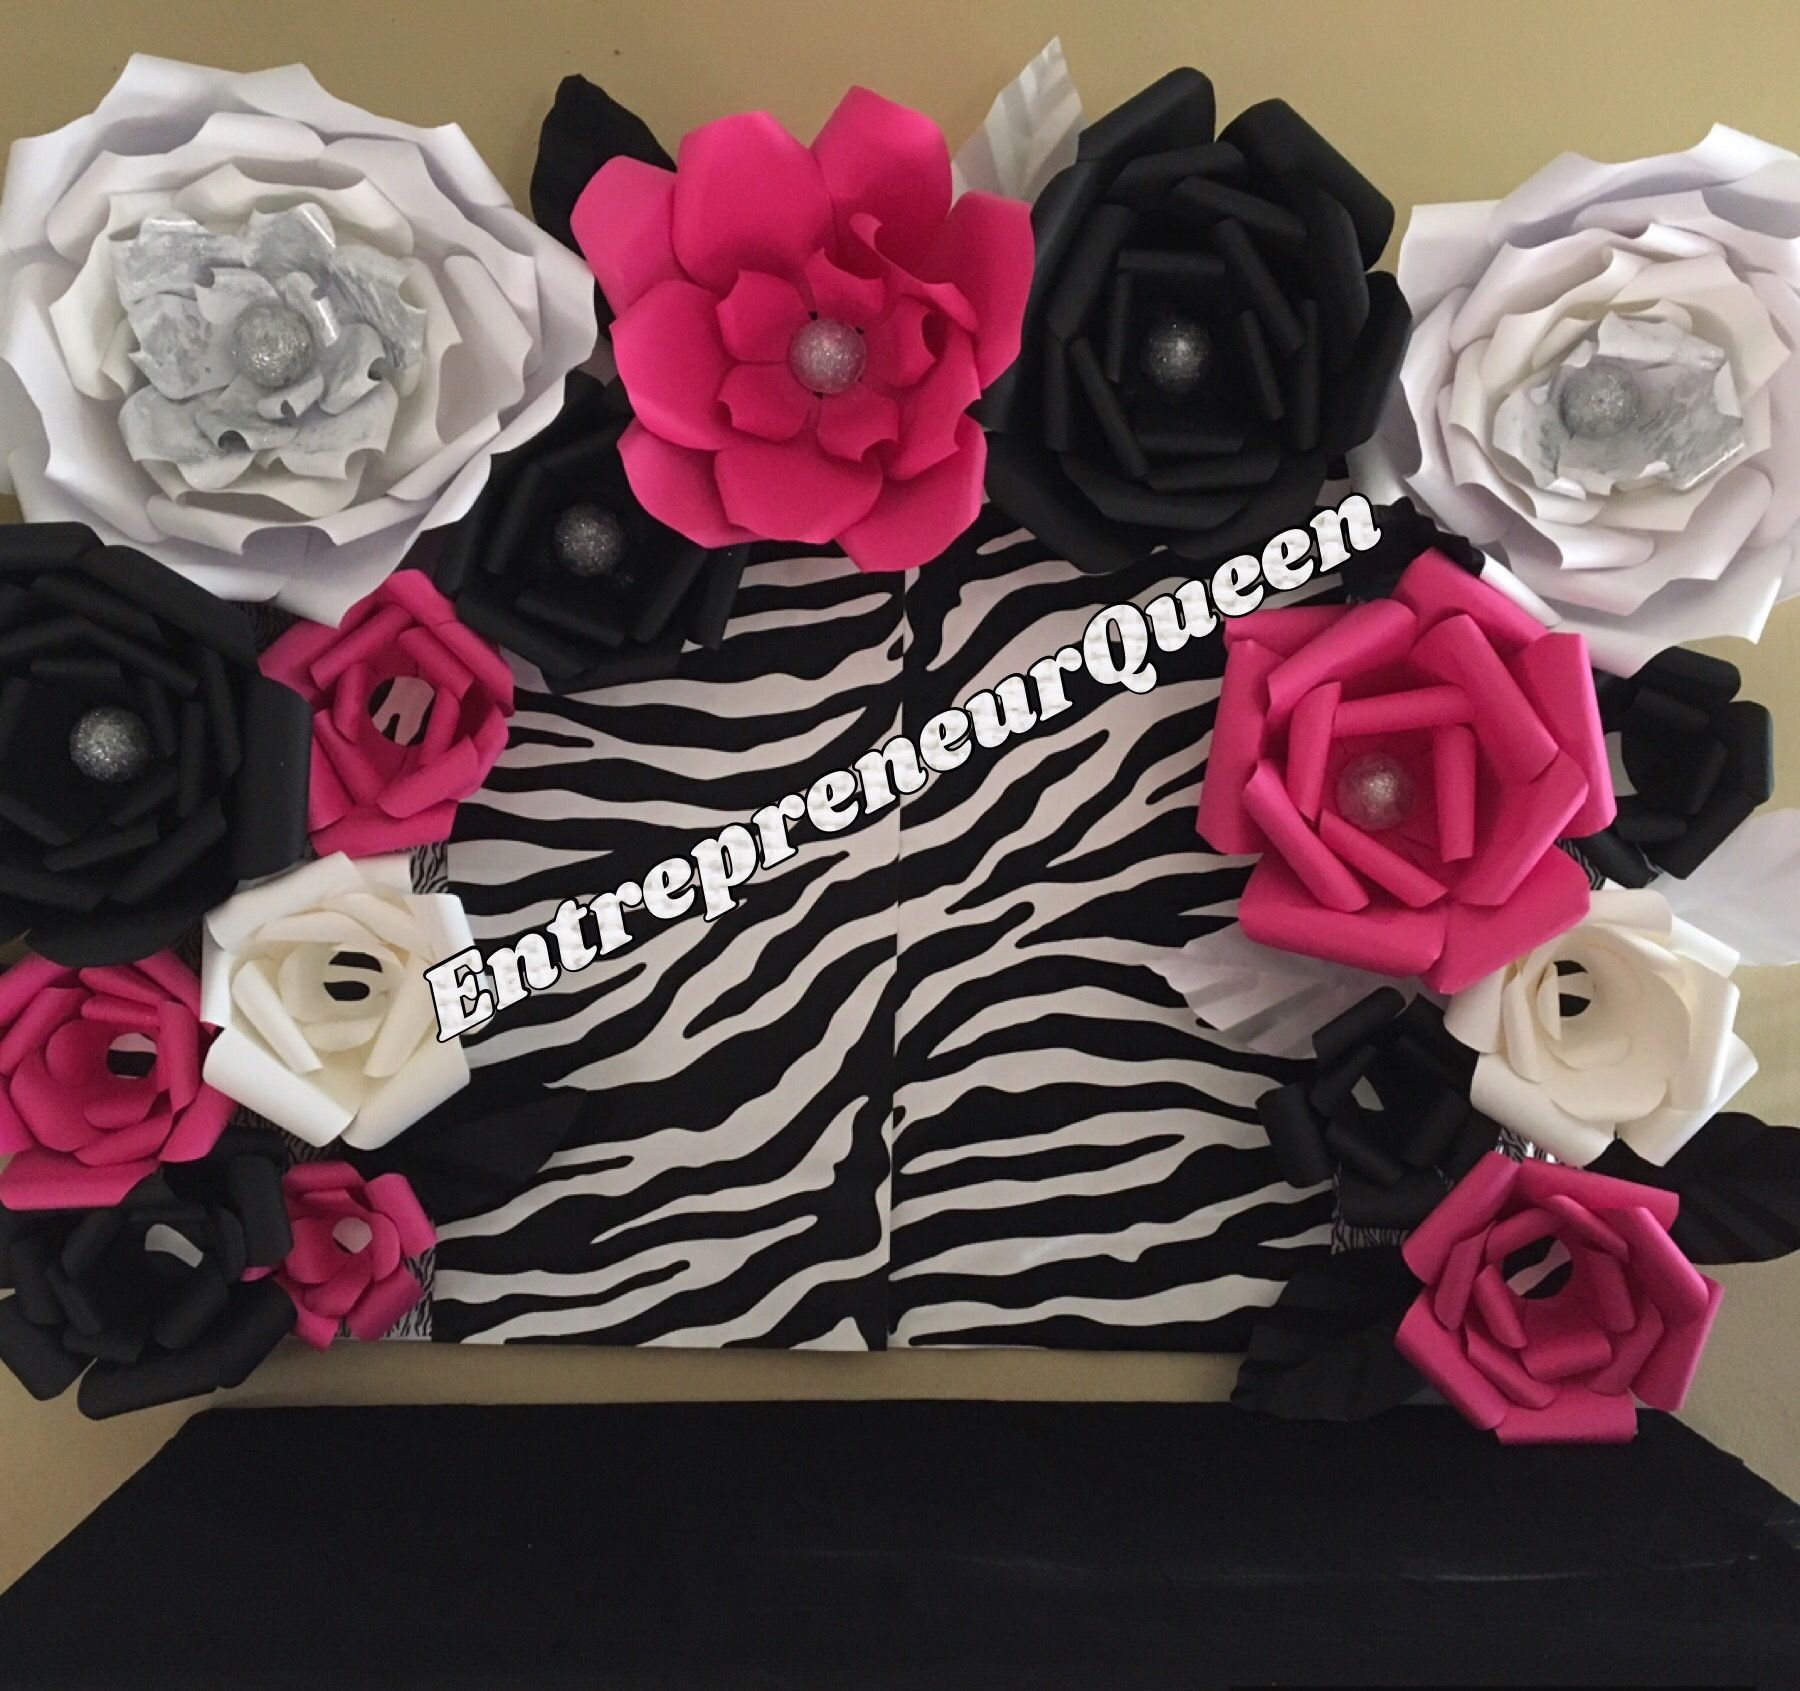 Duel Birthday Decor Zebra Barbie And Princess Themes: Barbie Zebra Print Birthday Party Candy…